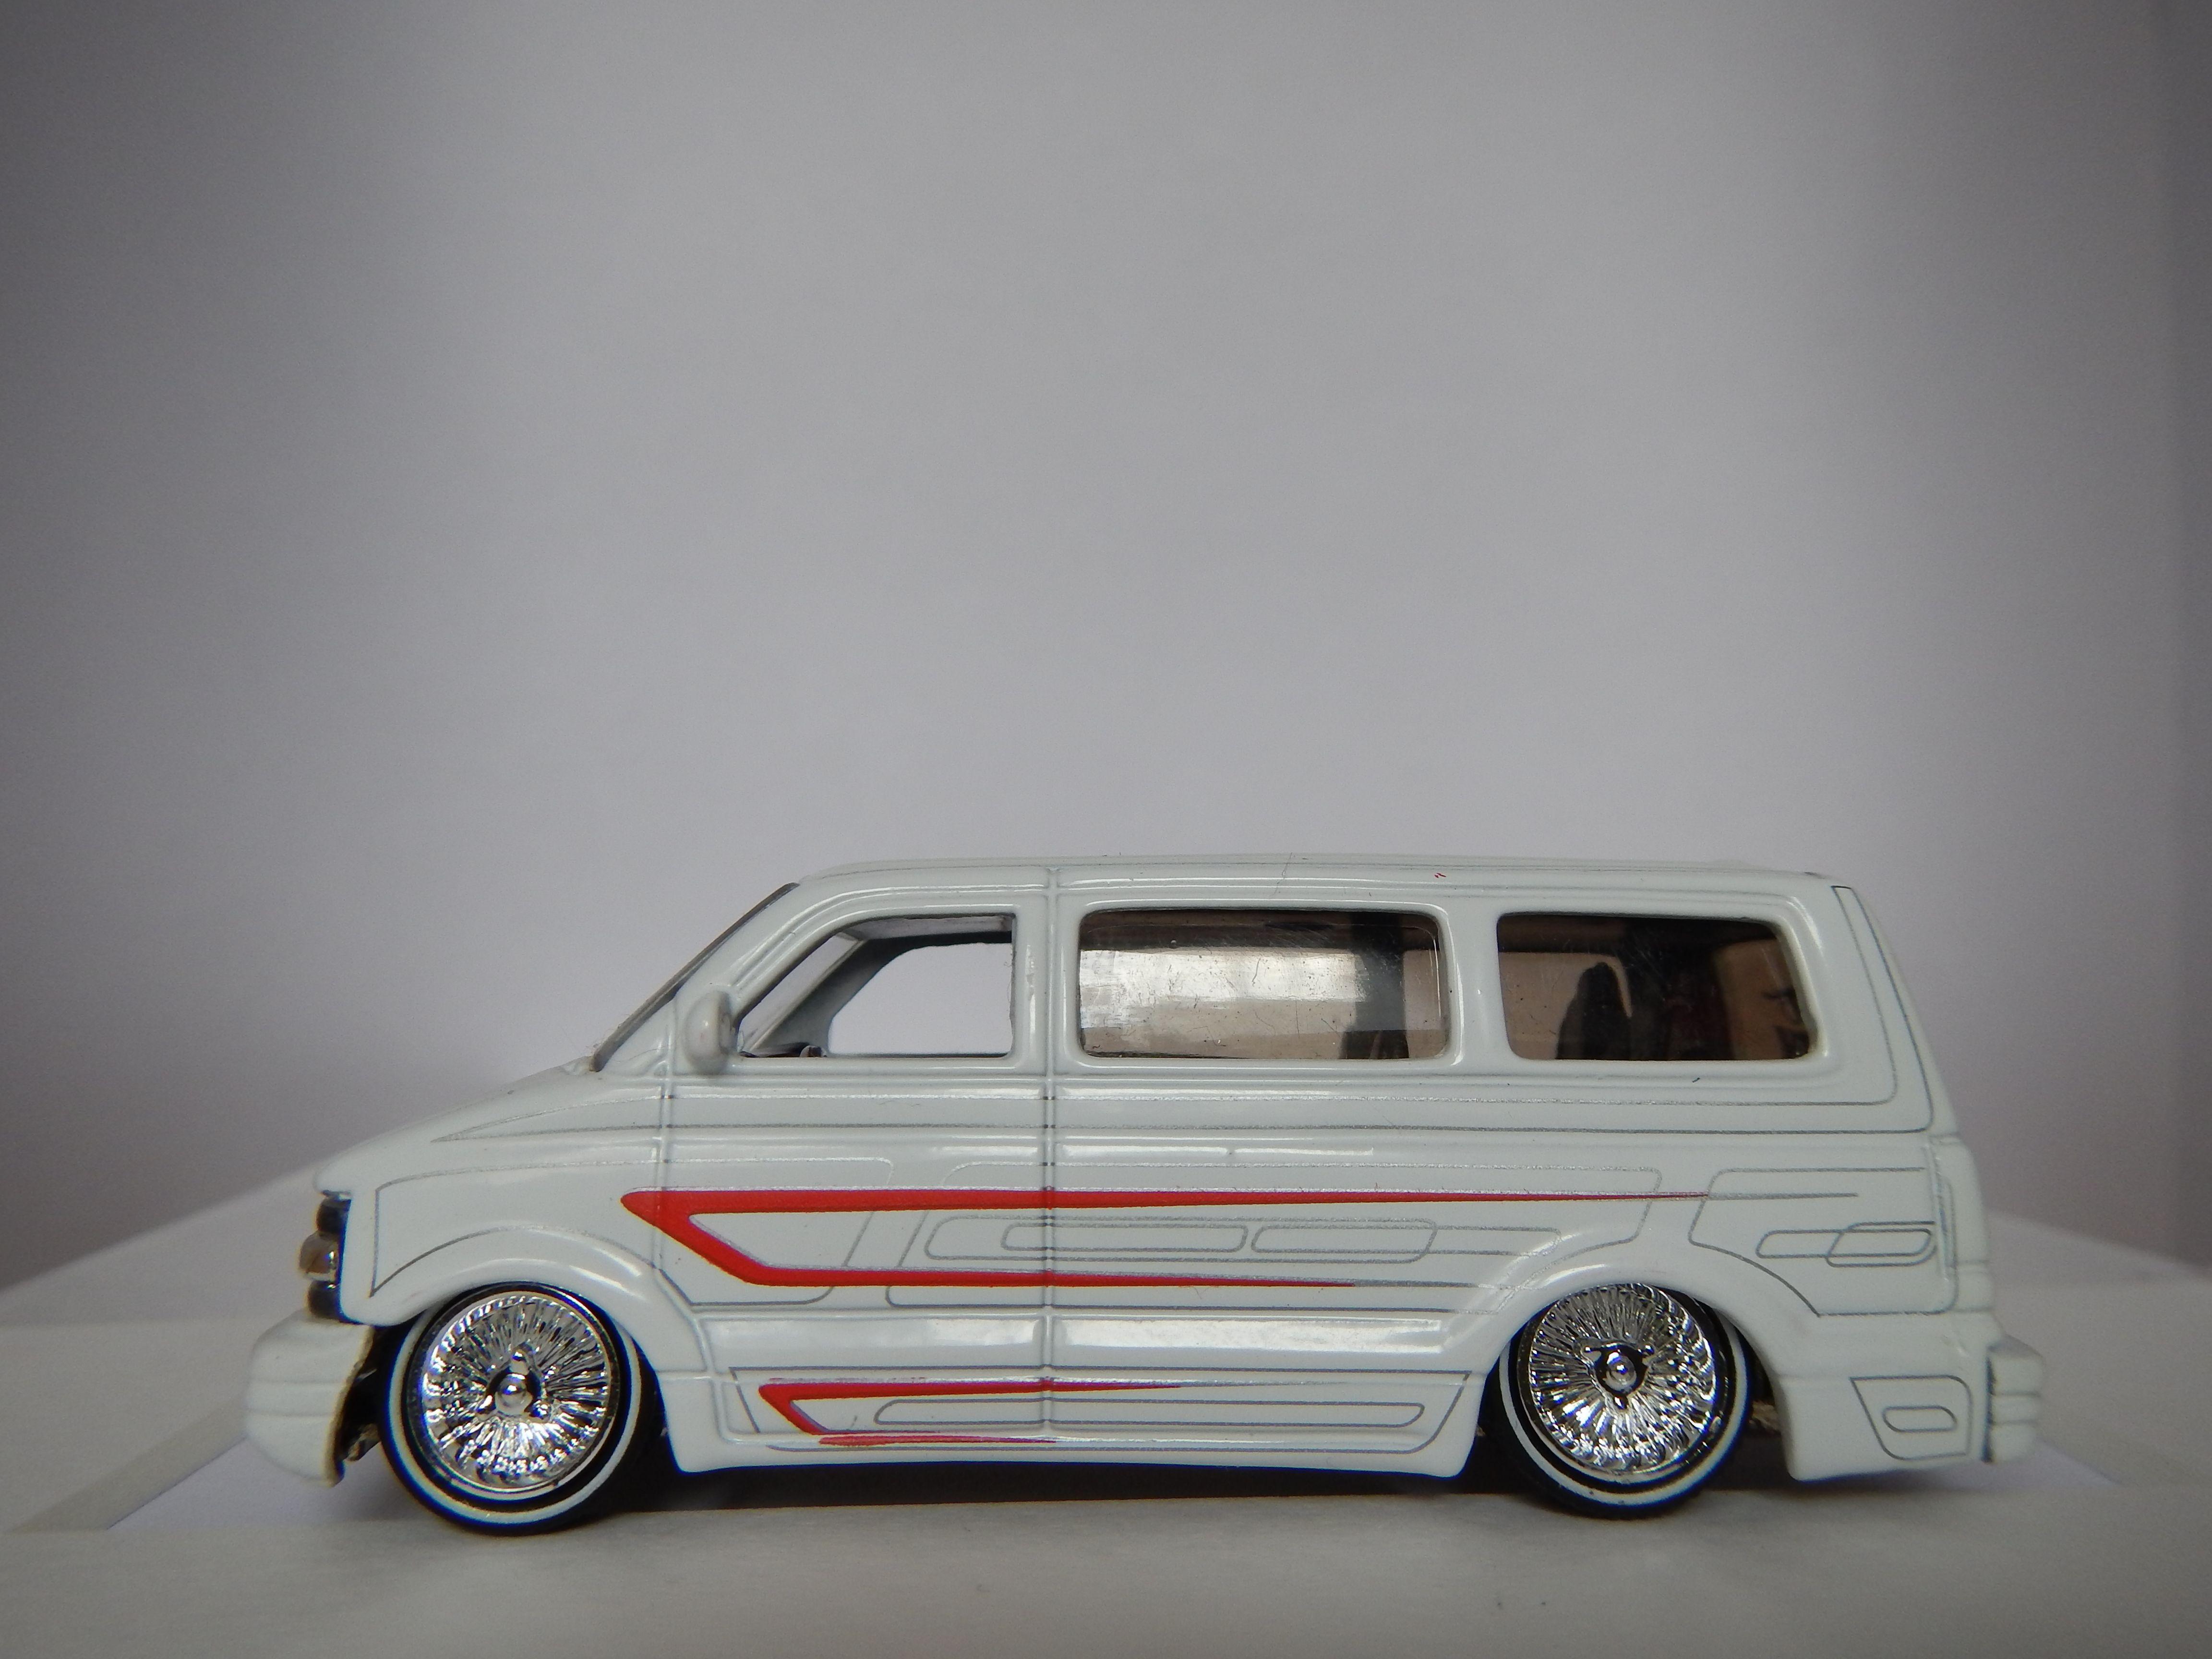 hight resolution of 2001 chevrolet astro van by jada toys china